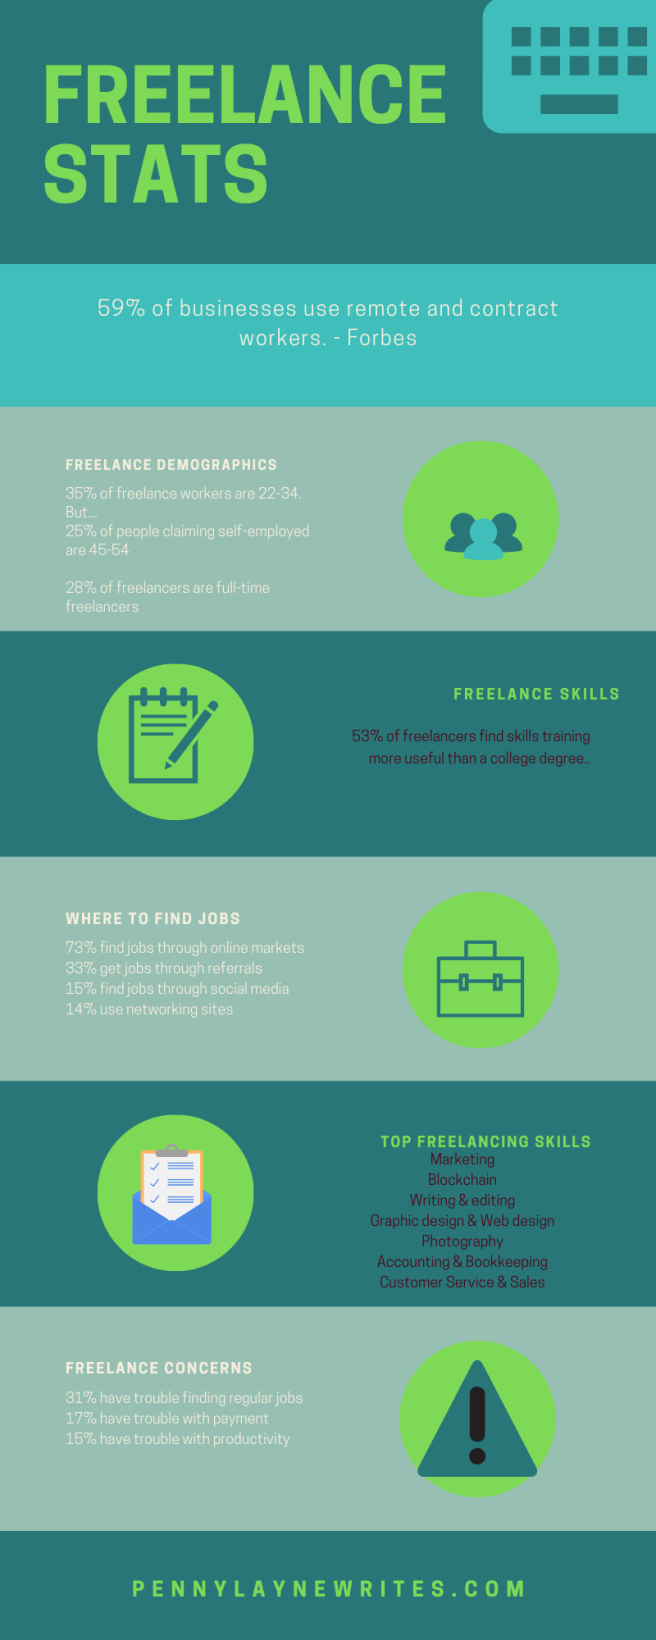 Freelance stats